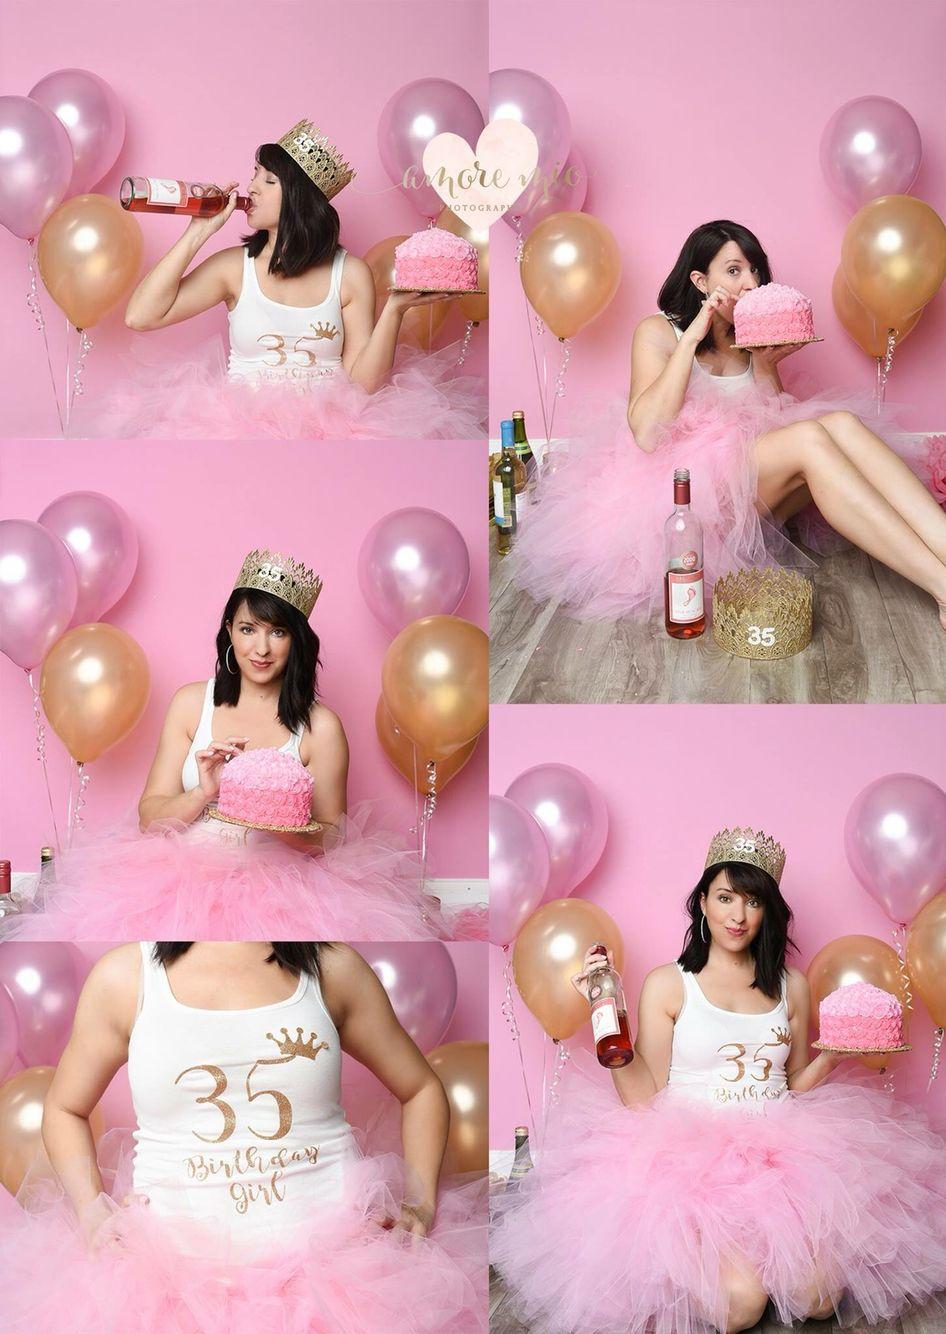 Fun Adult cake smash (With images) Birthday photoshoot